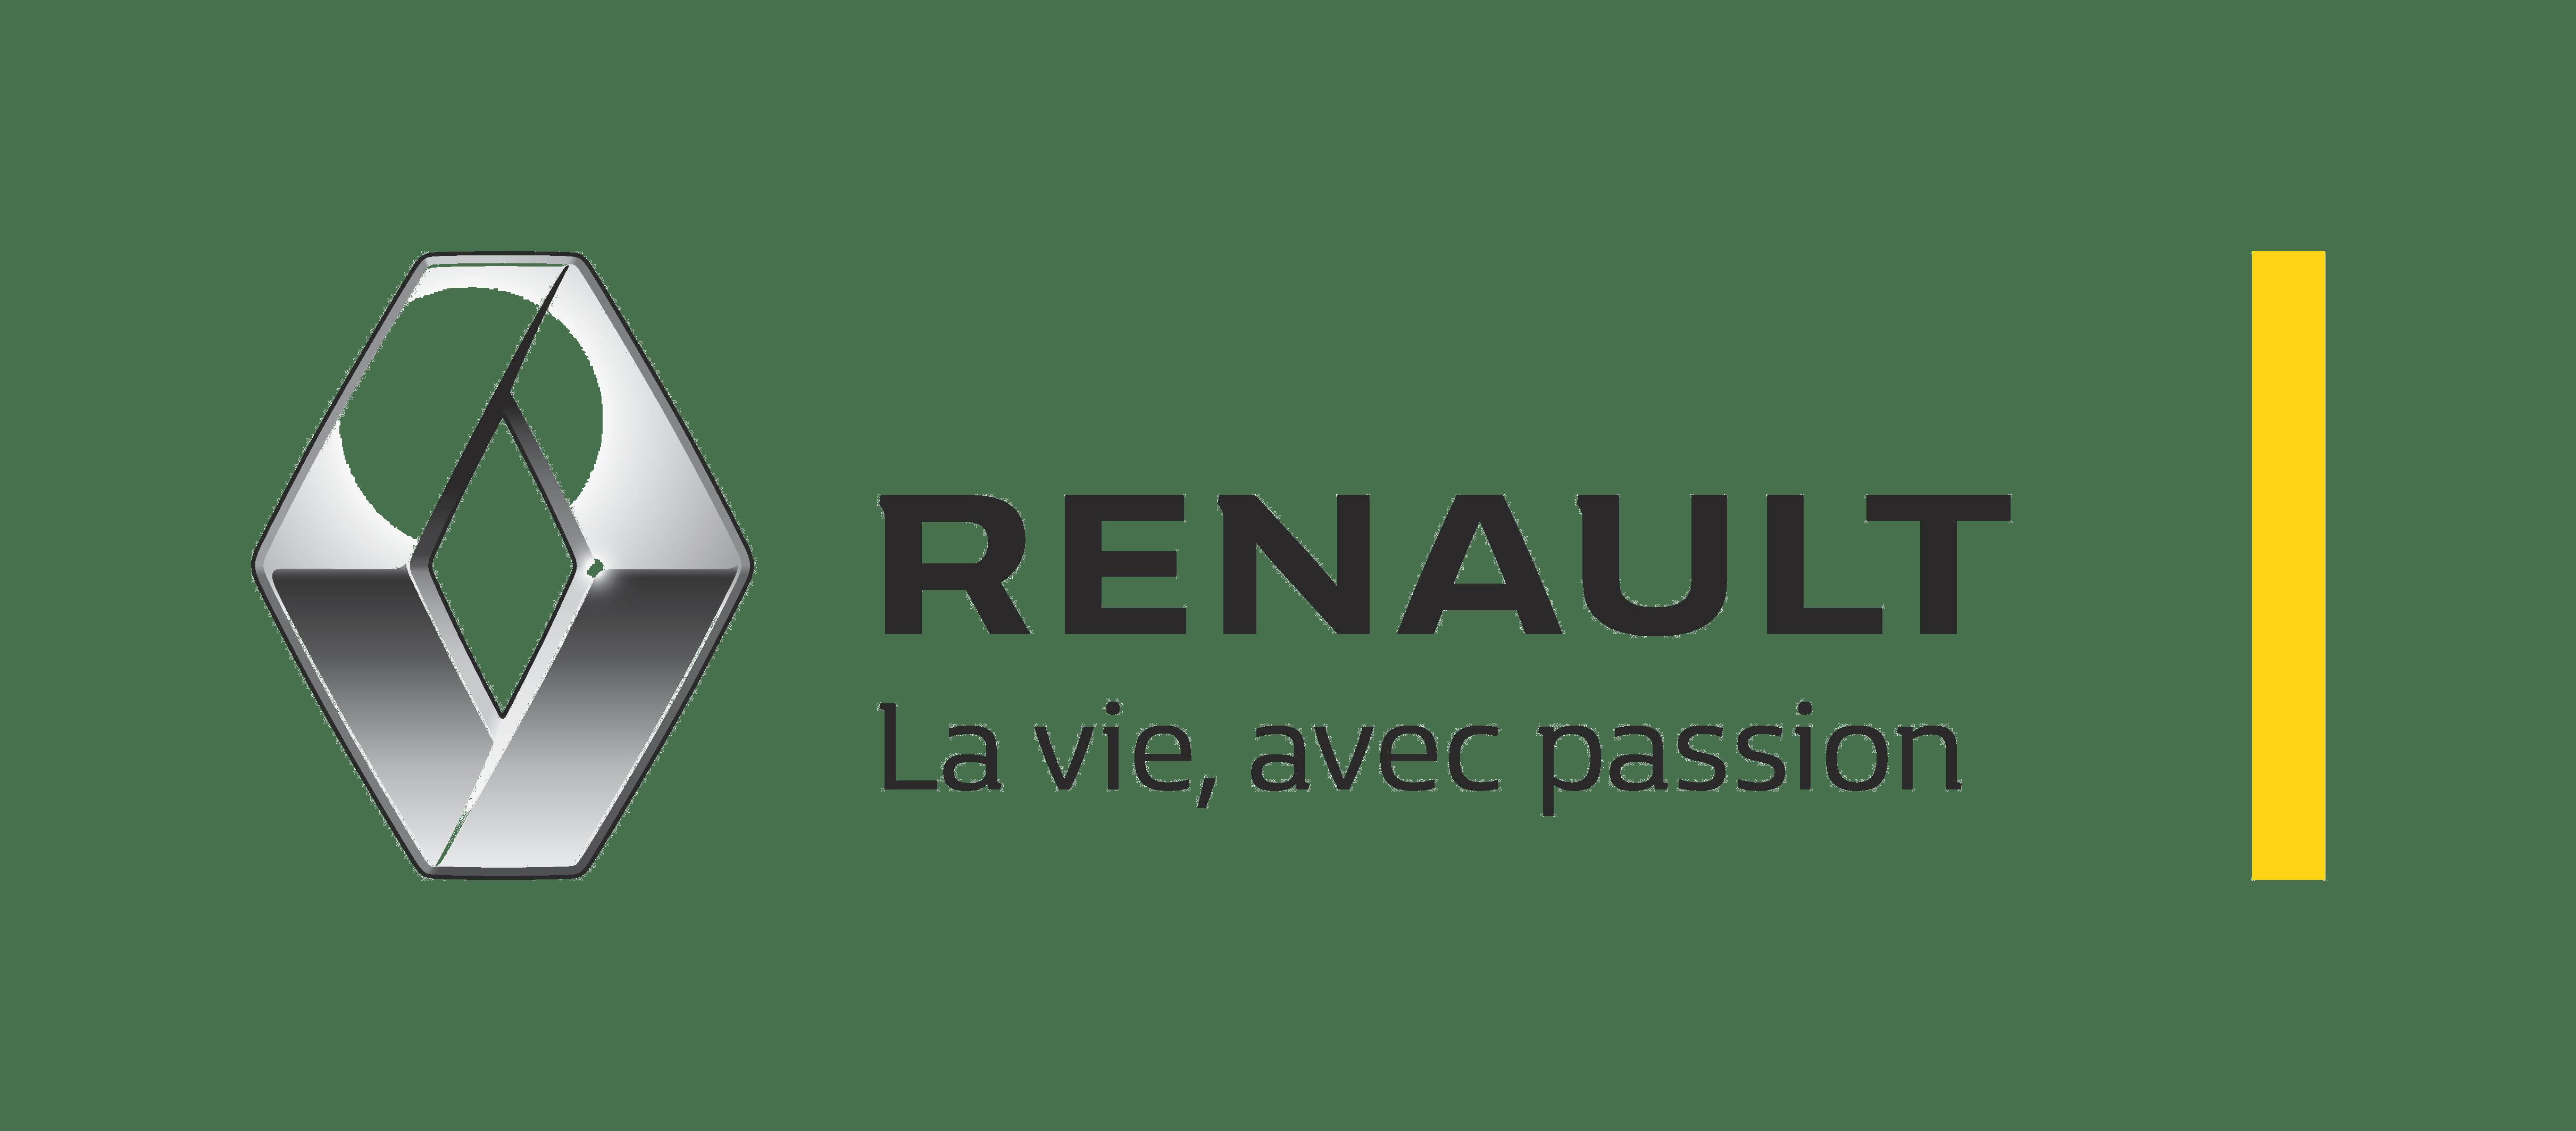 logo-renault- tagline-page-001 (1)